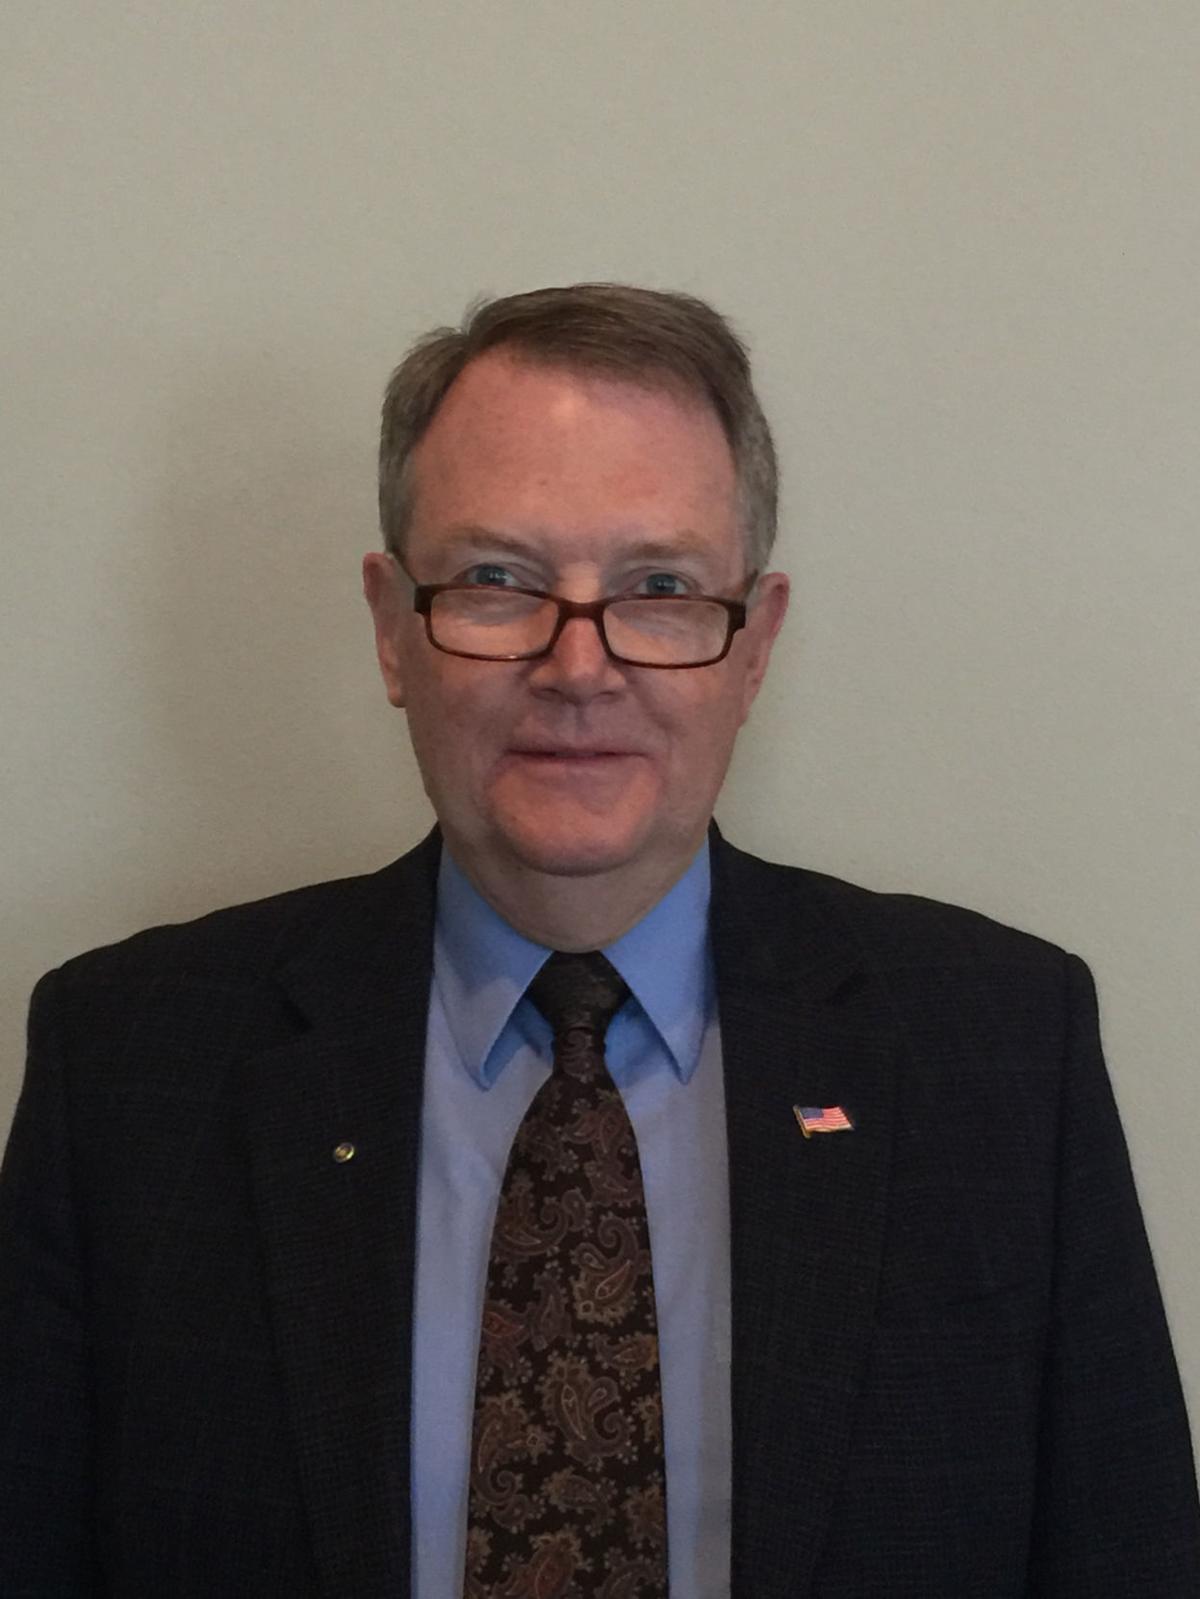 Joel Todd